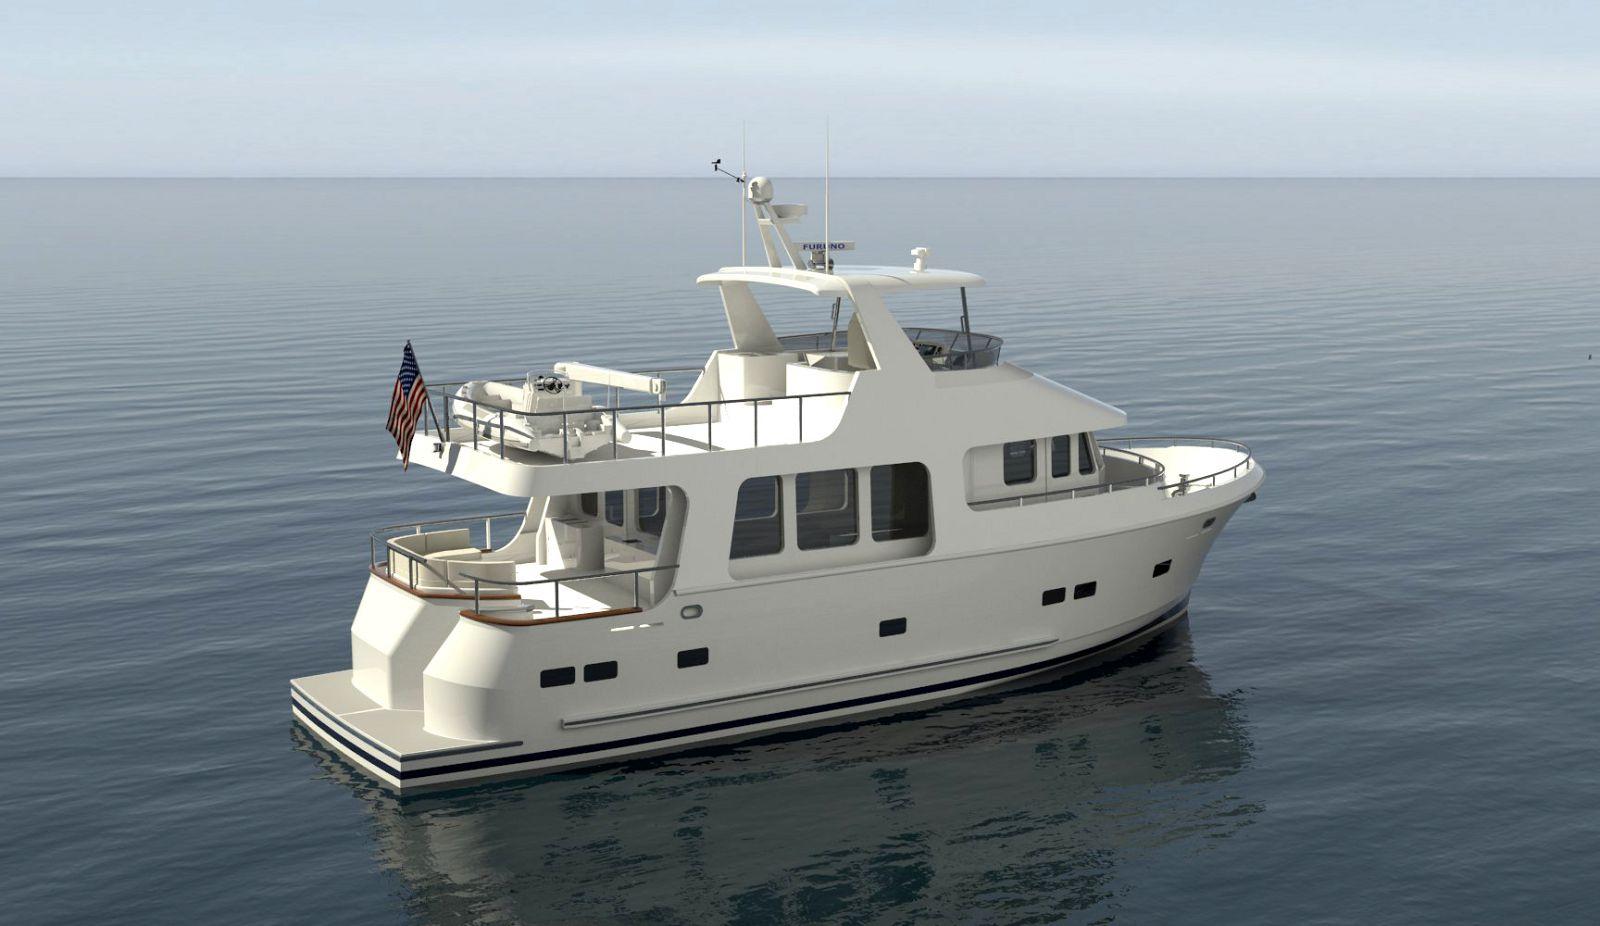 Alaskan-Yachts-57-MK-side-view